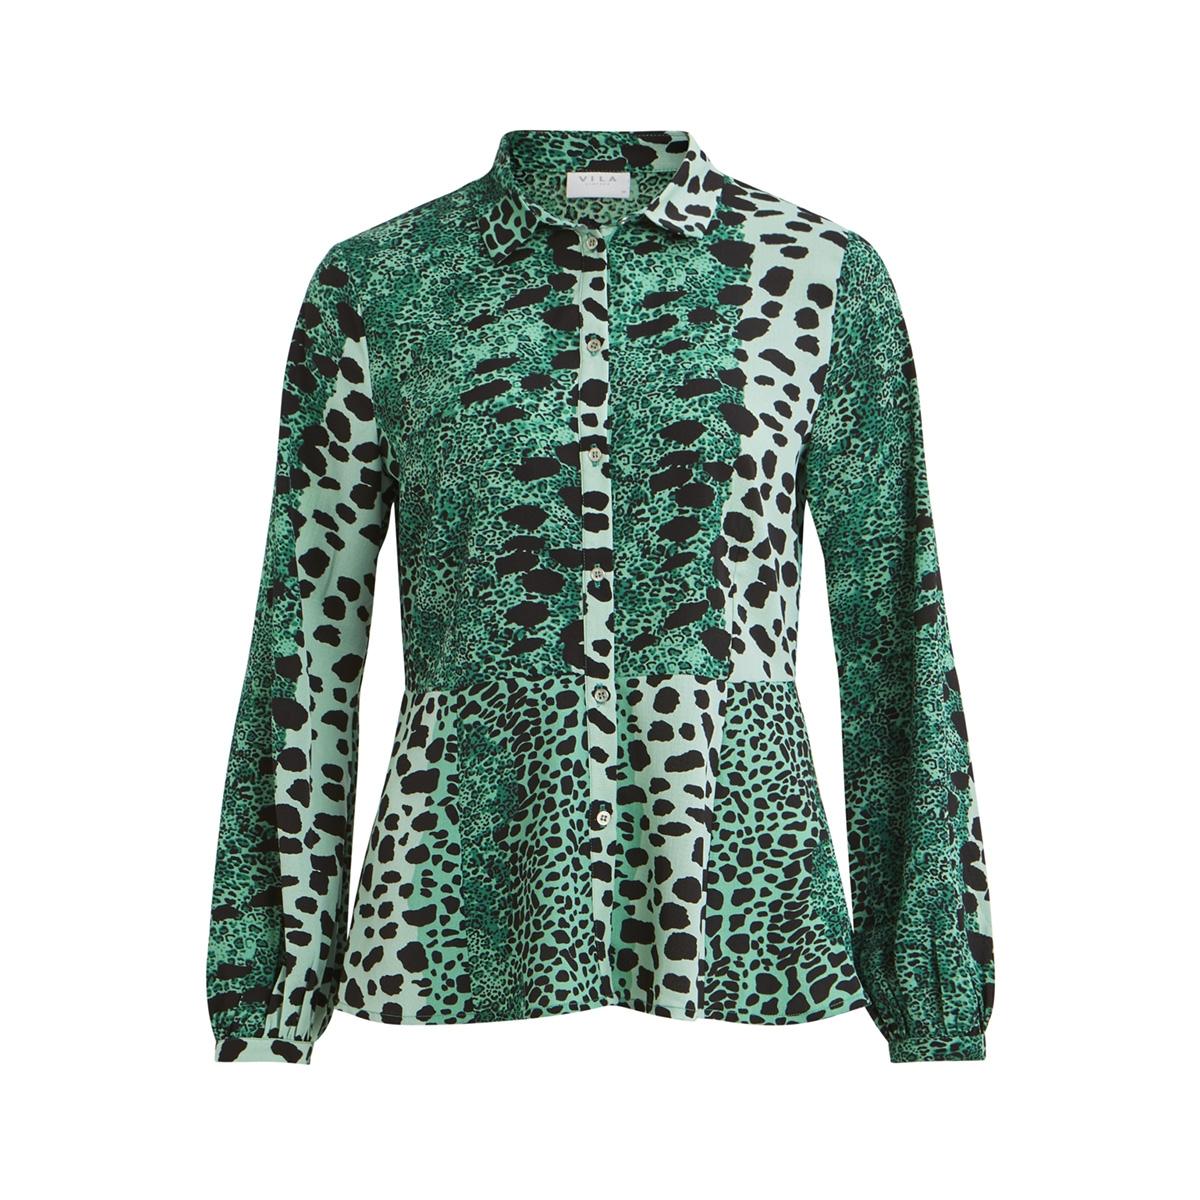 vileomi l/s shirt /rx 14053971 vila blouse pepper green/leo